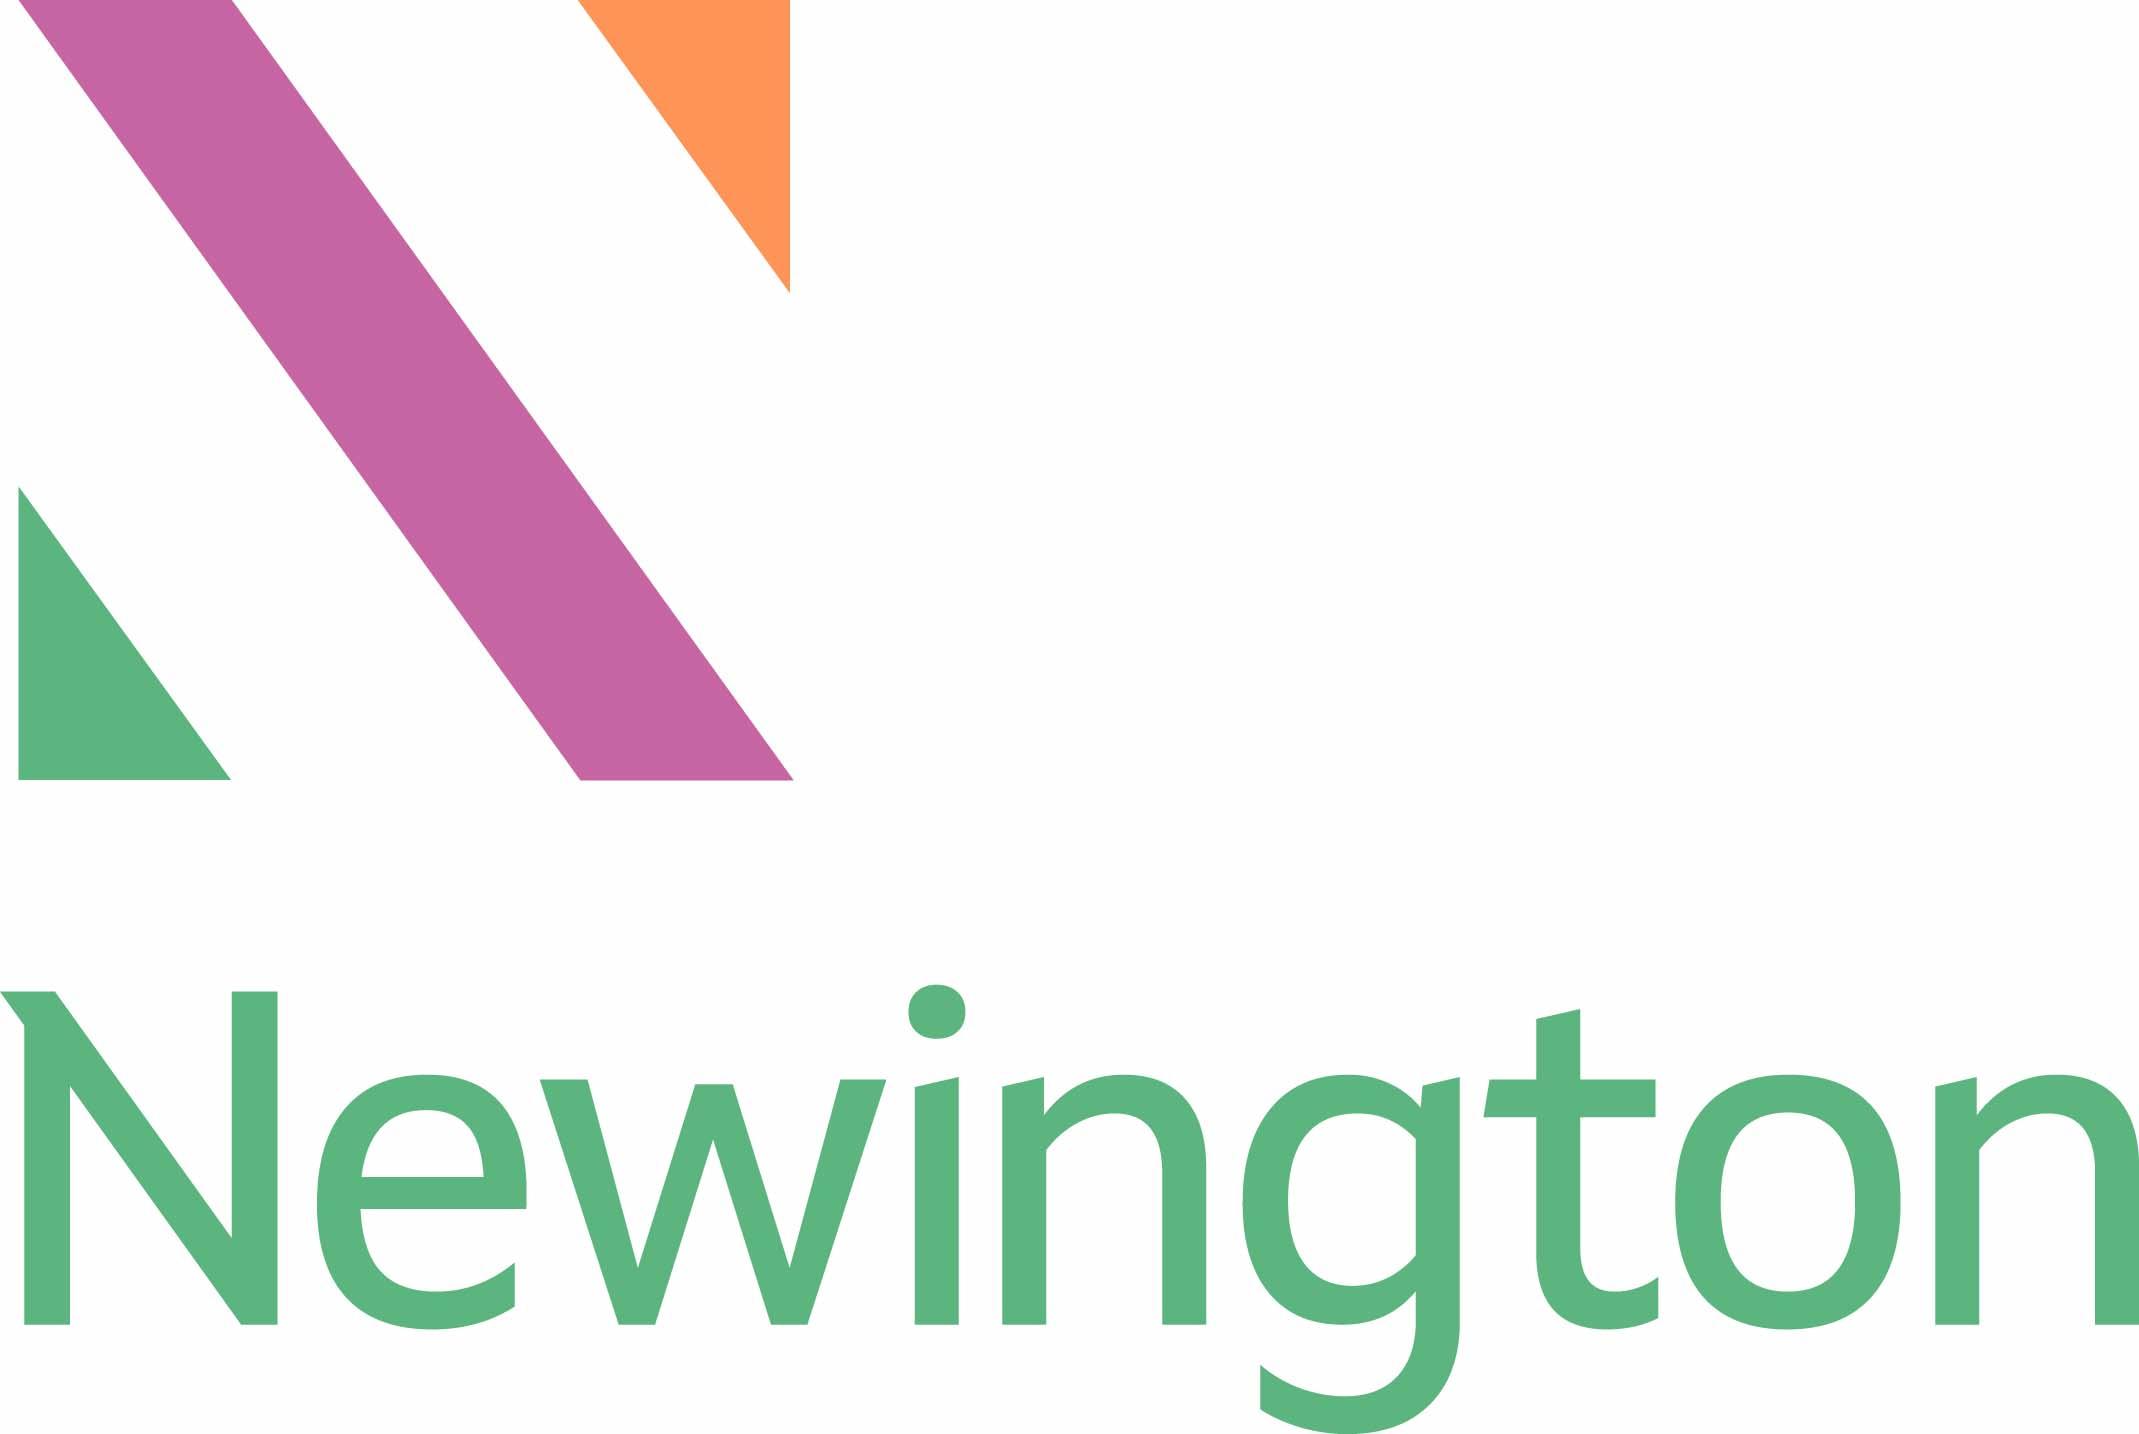 Newington_Master_CMYK.jpg